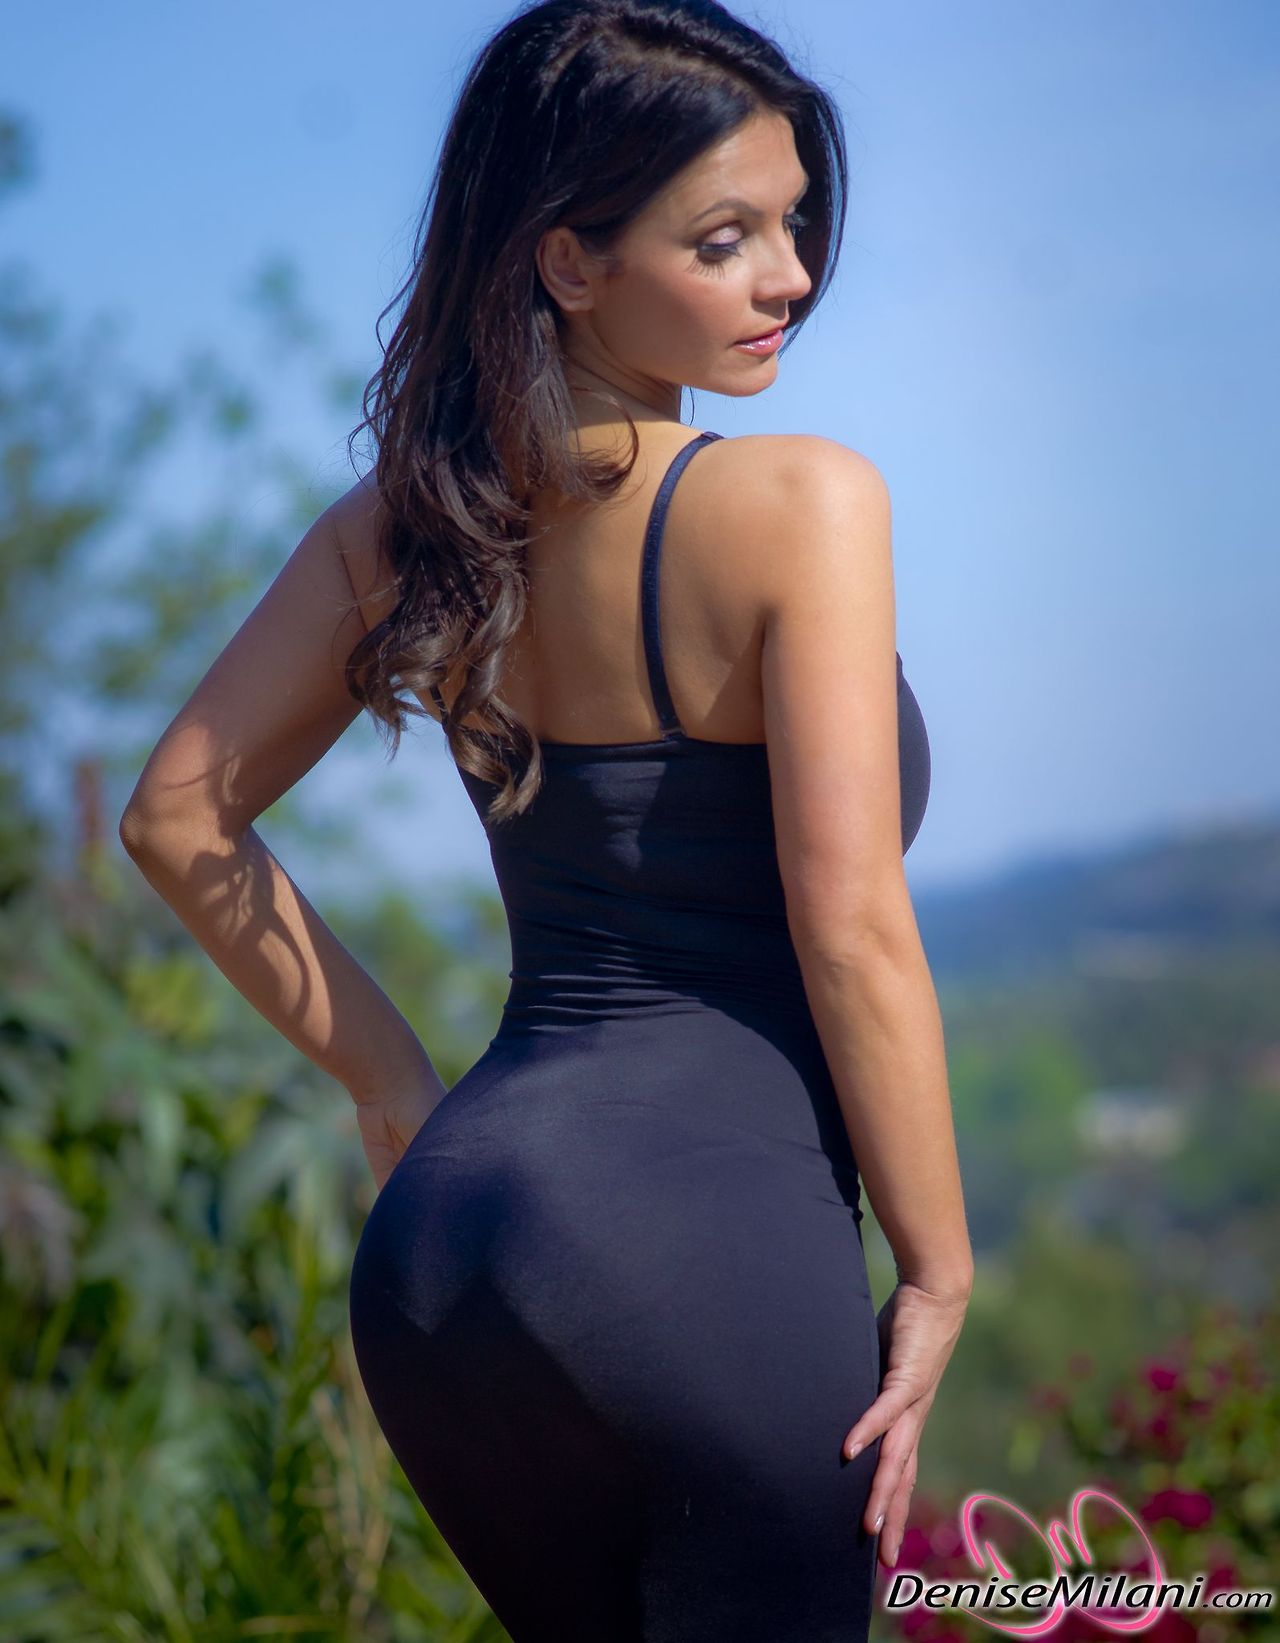 Denise Milani Pics Page 1